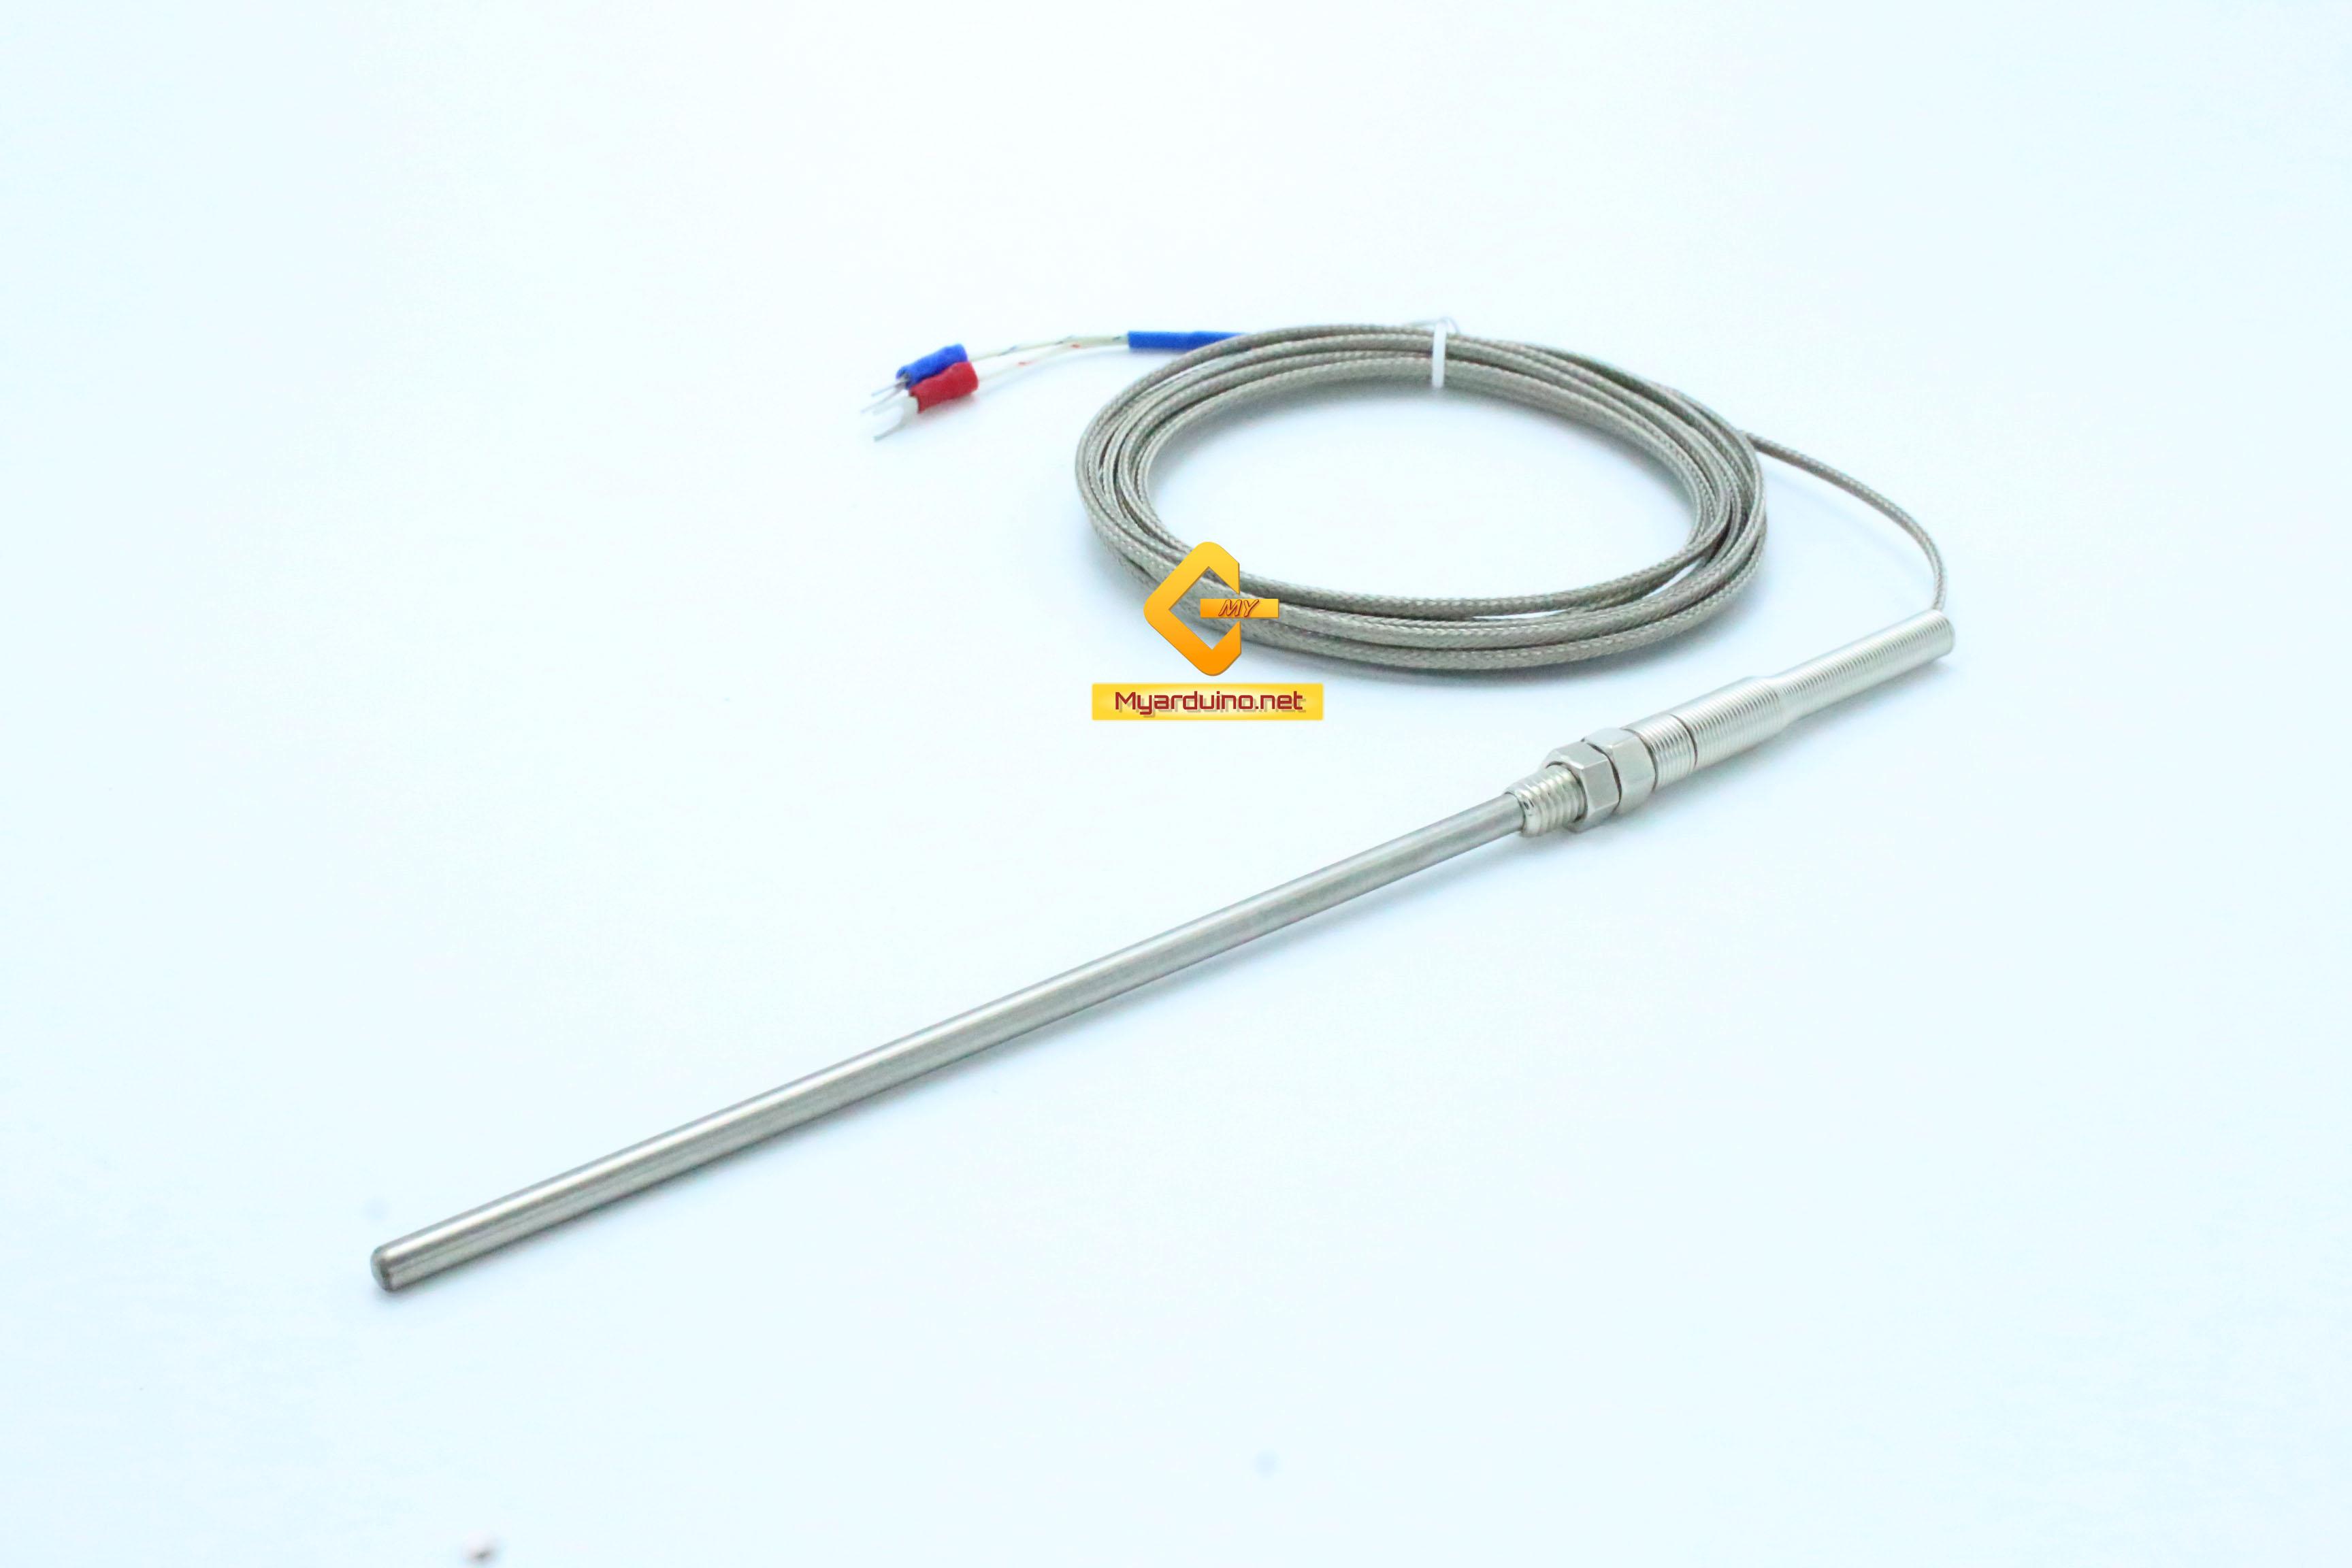 Thermocouple เซ็นเซอร์วัดอุณหภูมิ K-Type 0-800C ตัวเซนเซอร์ ยาว 150mm สายยาว 3m